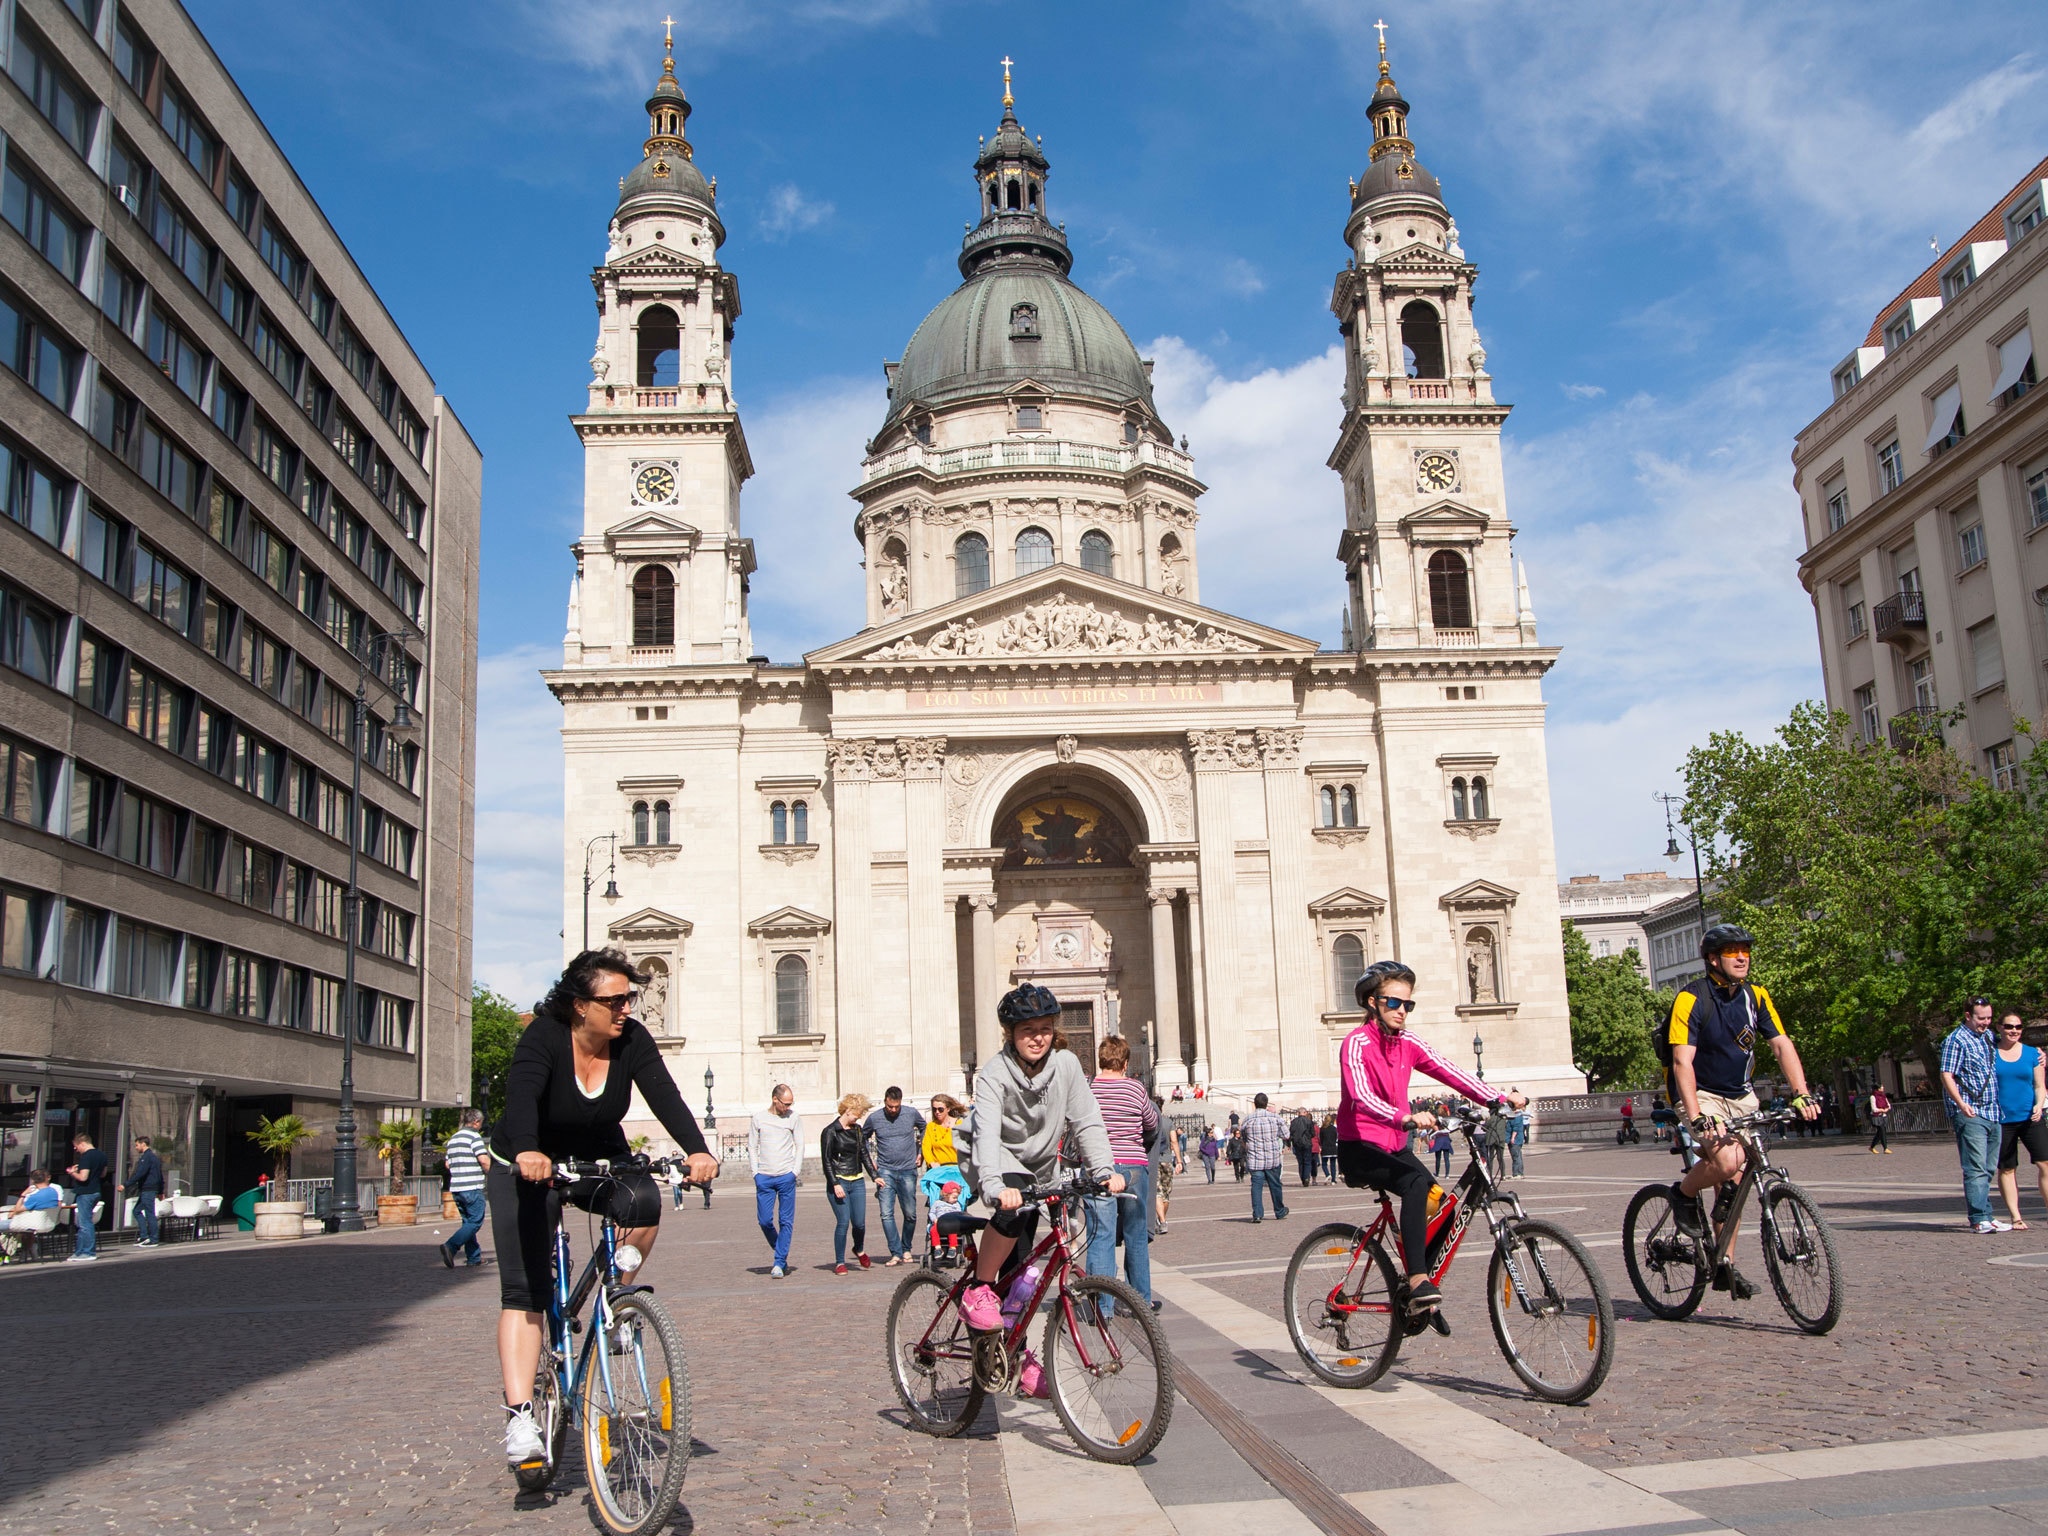 St. Stephen's Basilica - Budapest - Hungary